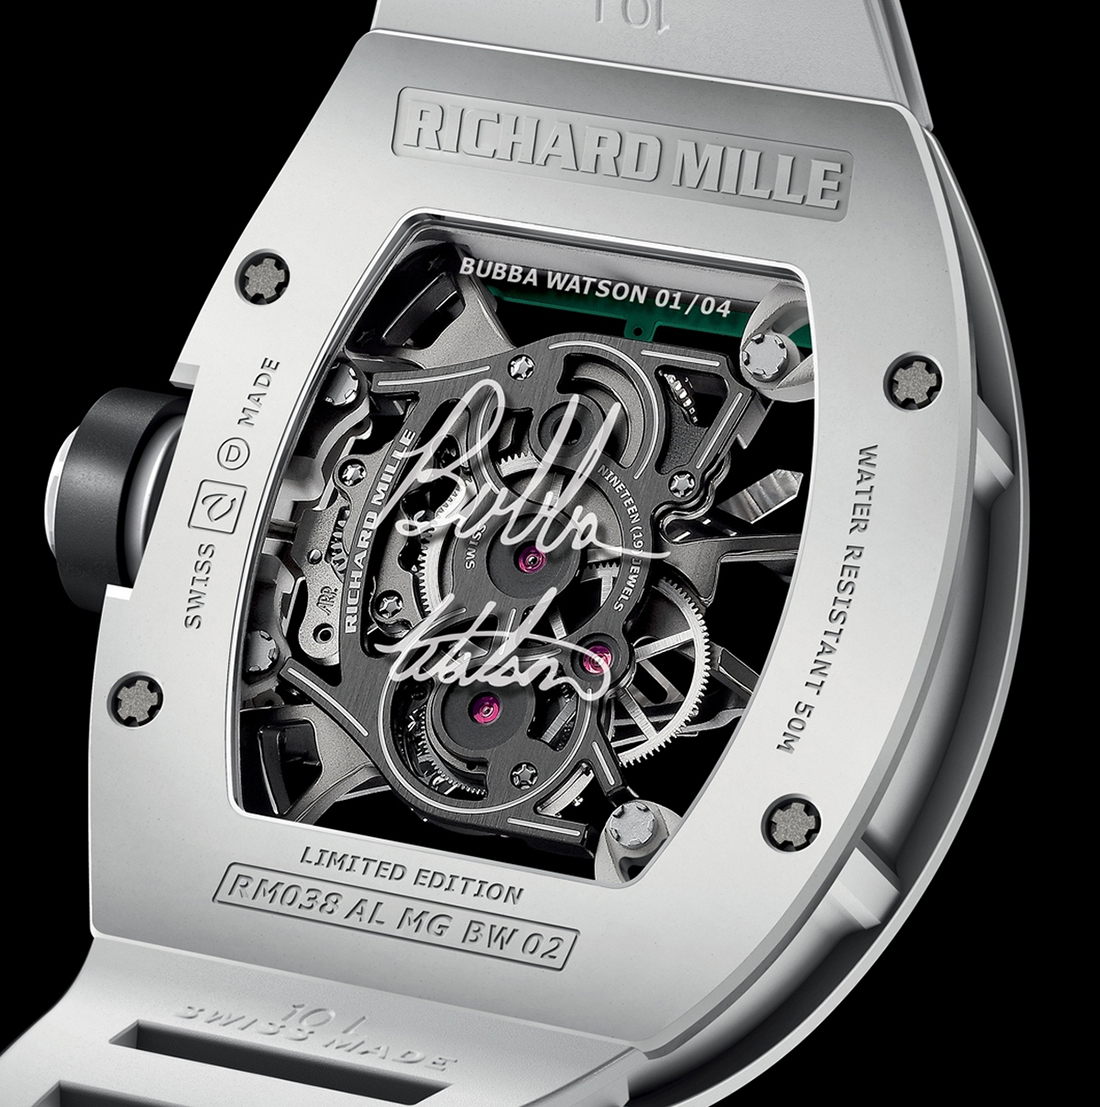 Richart-Mille-Bubba_Watson-RM038-victory-watch-02